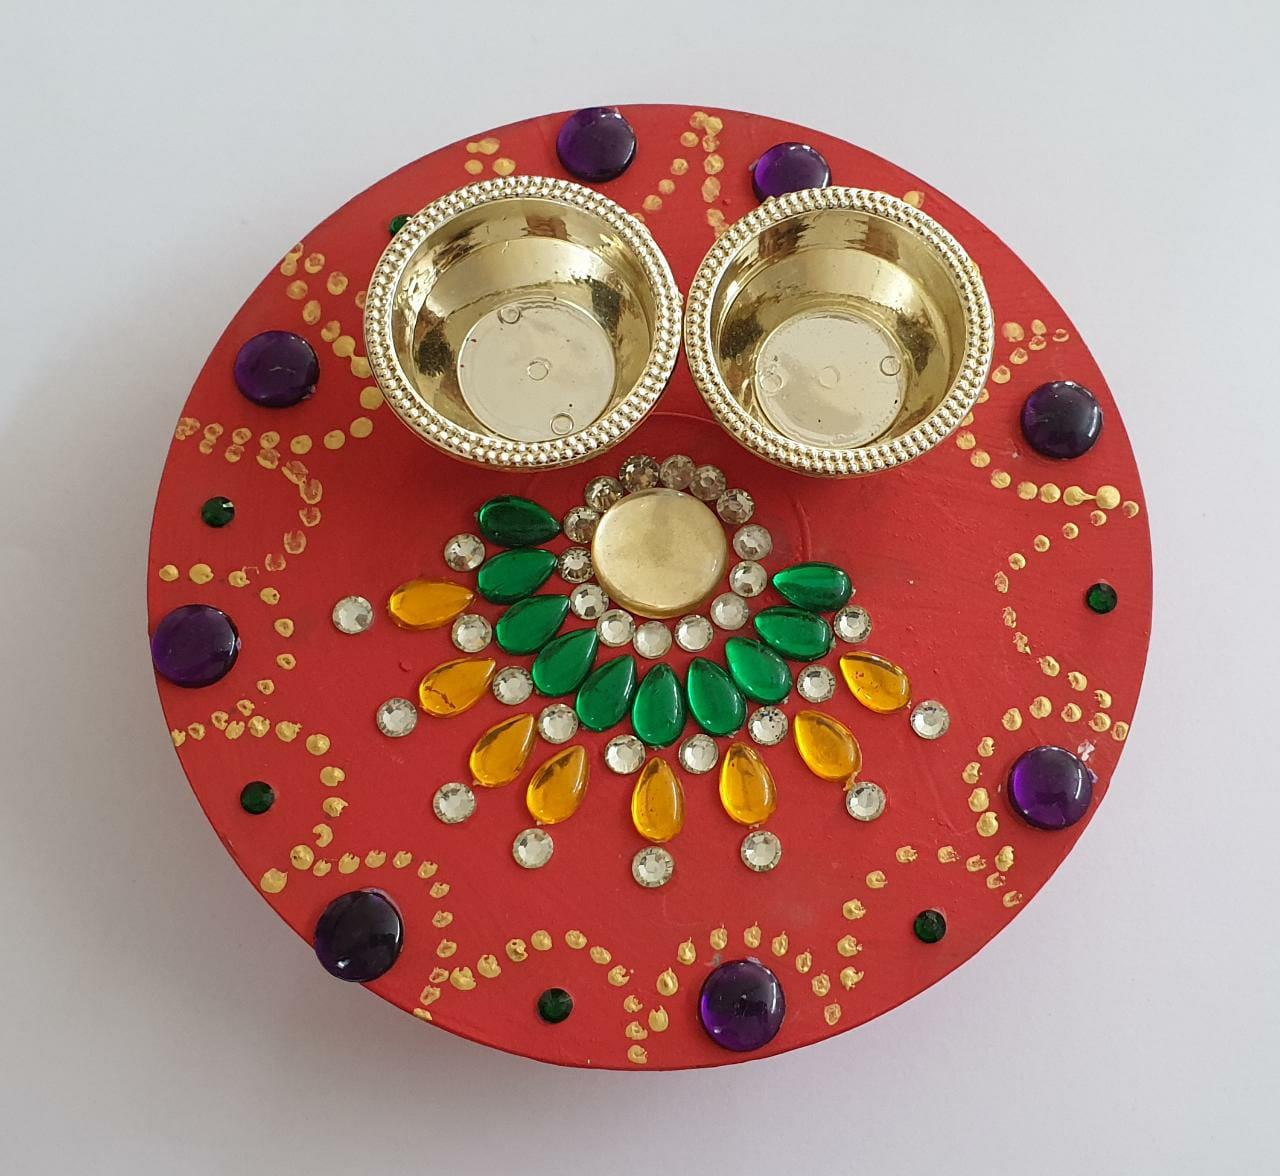 Diwali Hamper (Kumkum Chokha Plate, 4 Diyas, Roasted Almond, Roasted Cashew, Raisins, Honey) Slider Thumbnail 2/5